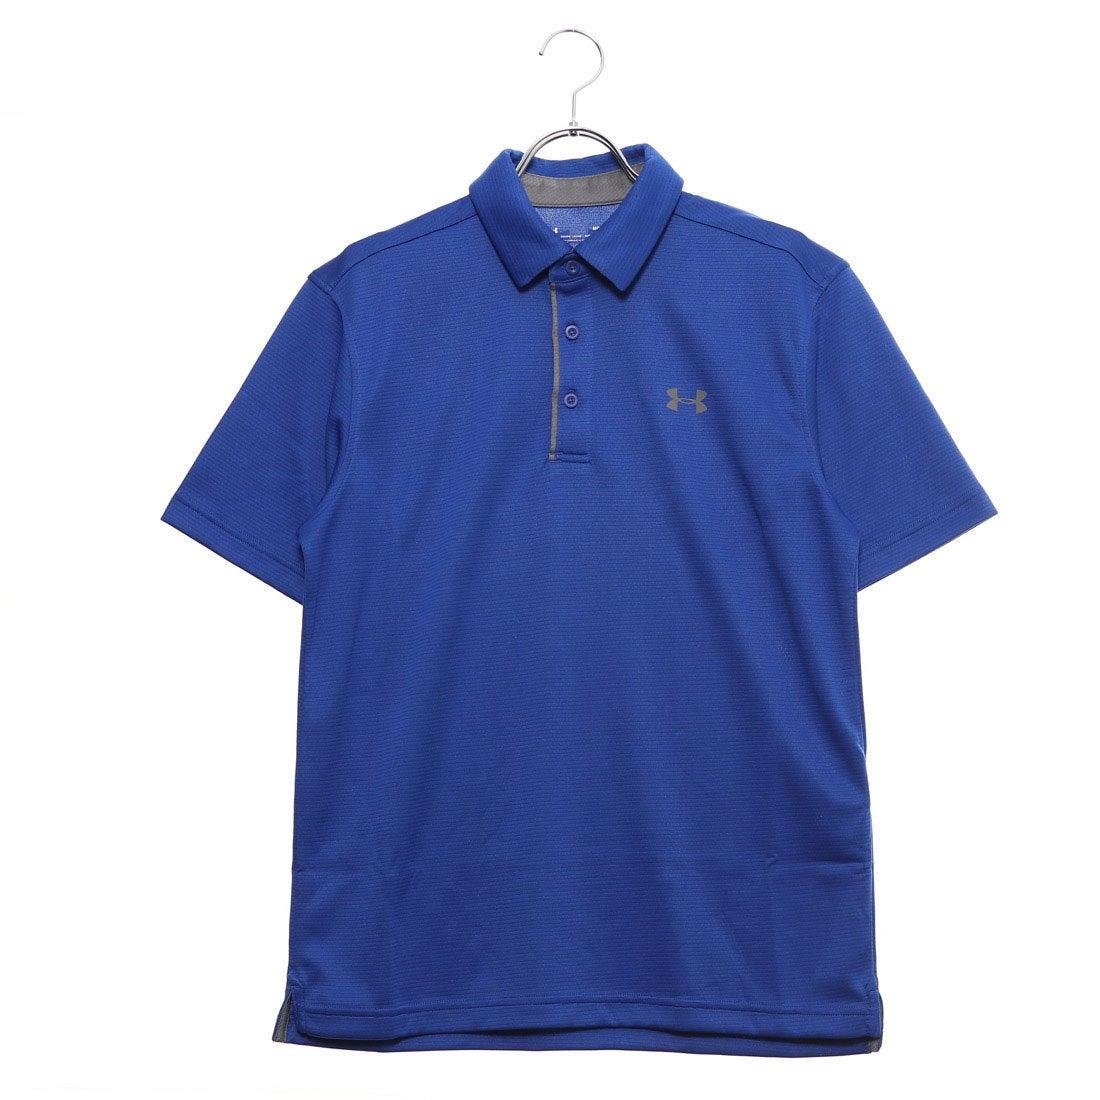 12b33d8115e624 アンダーアーマー UNDER ARMOUR メンズ 半袖ポロシャツ UA Tech Polo ...